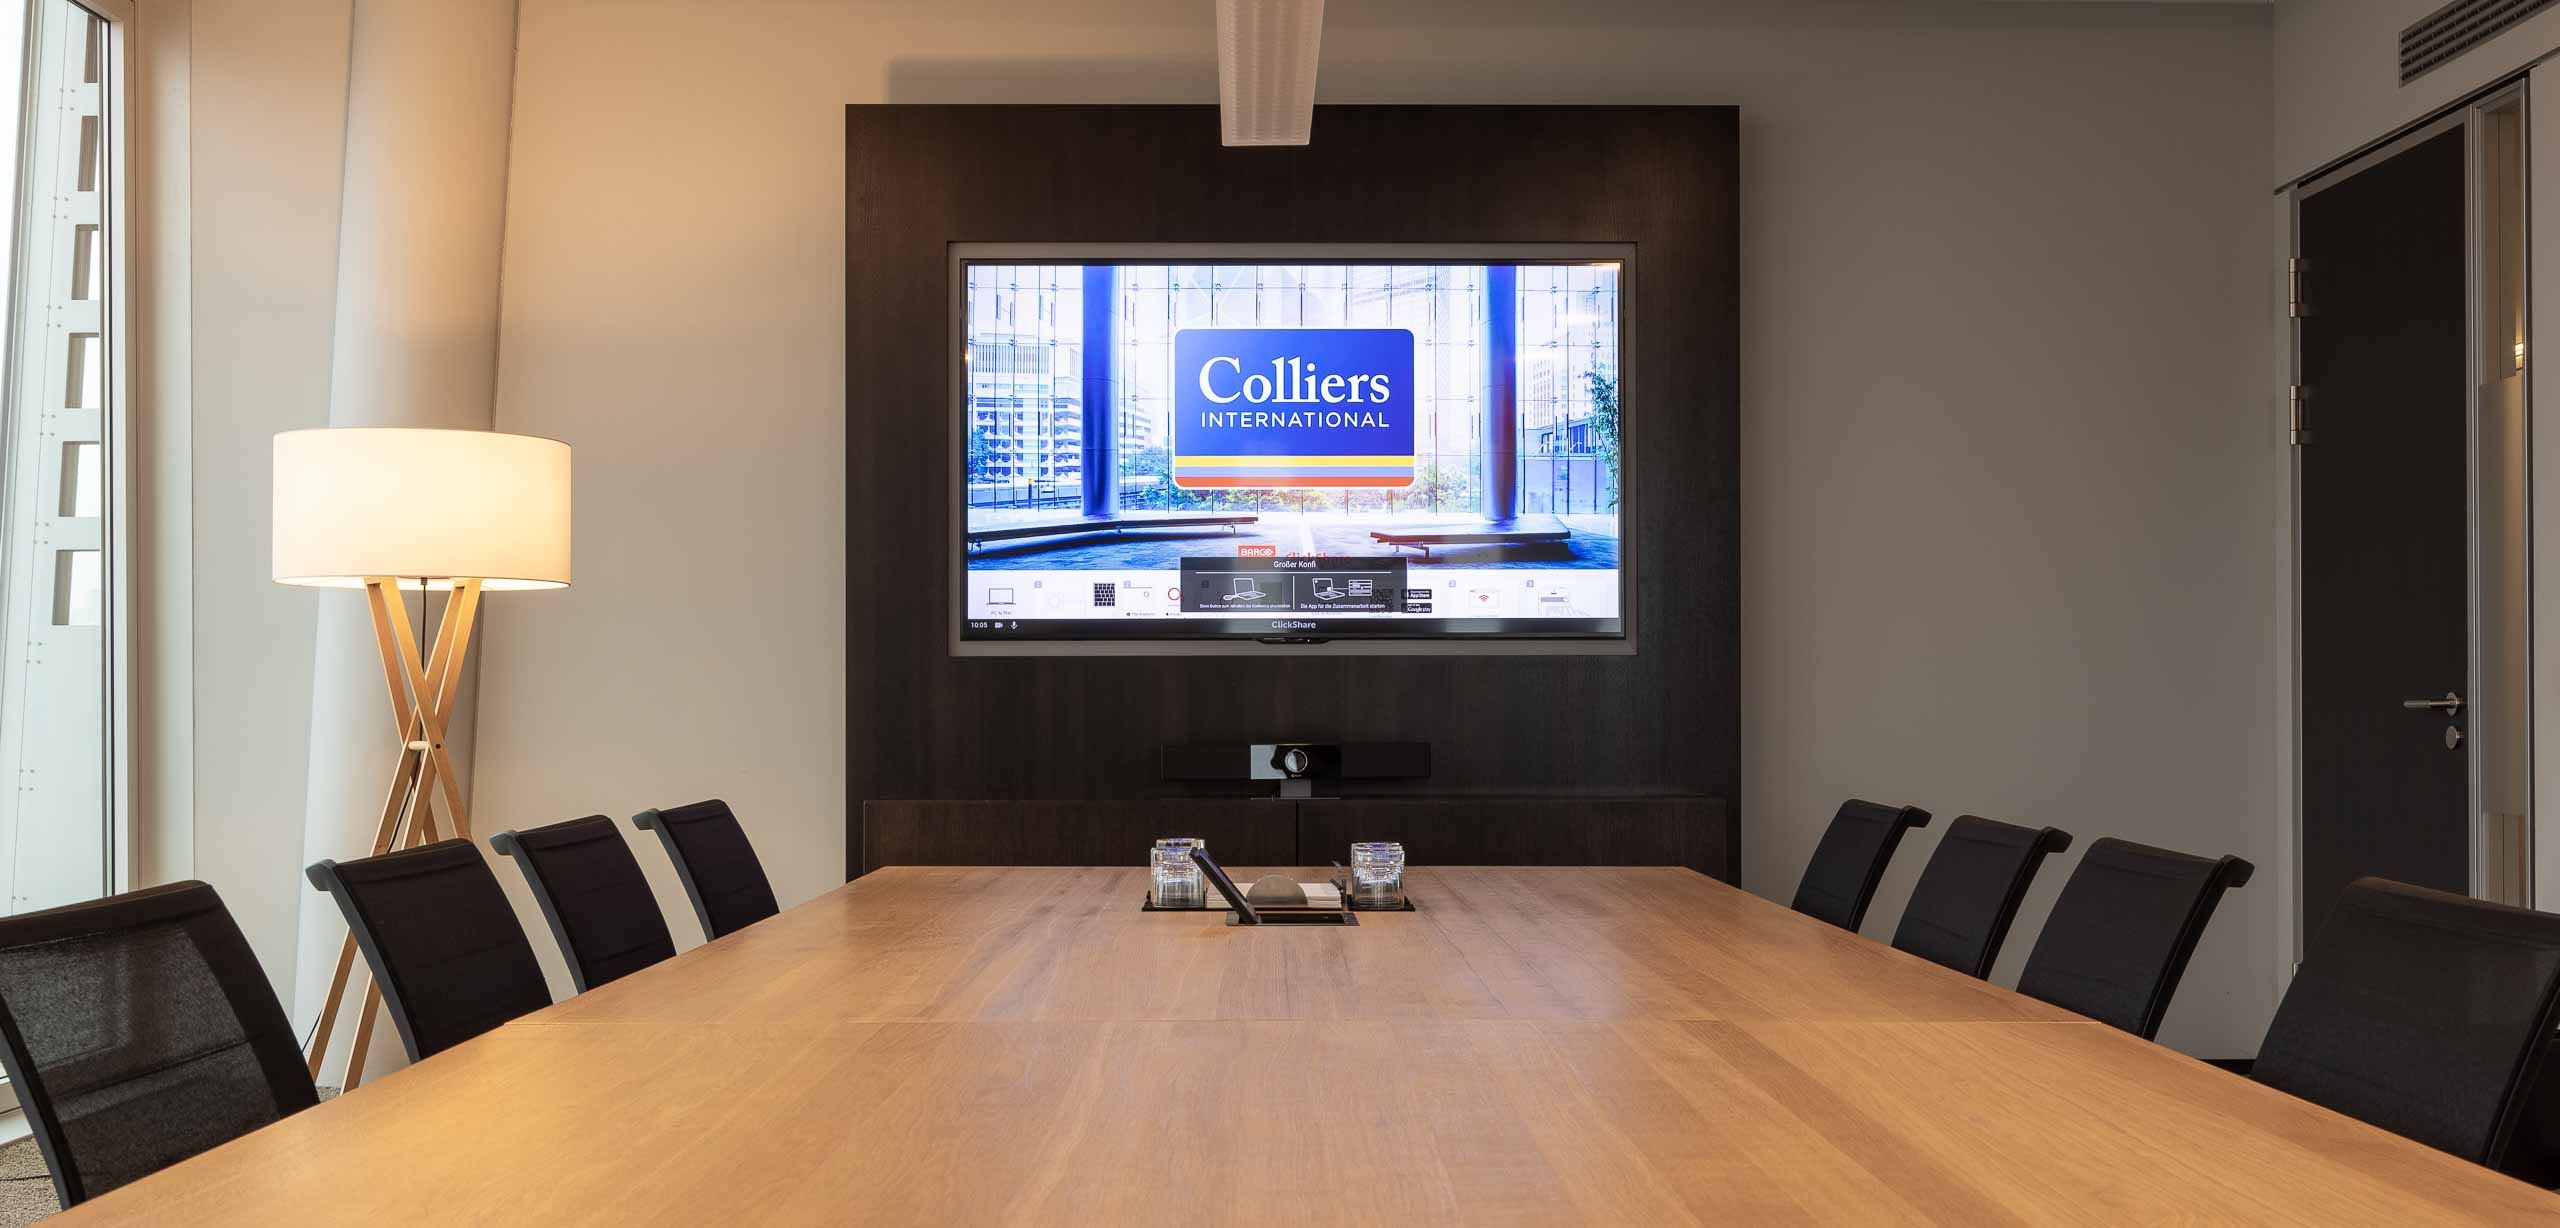 Colliers-Frankfurt-front